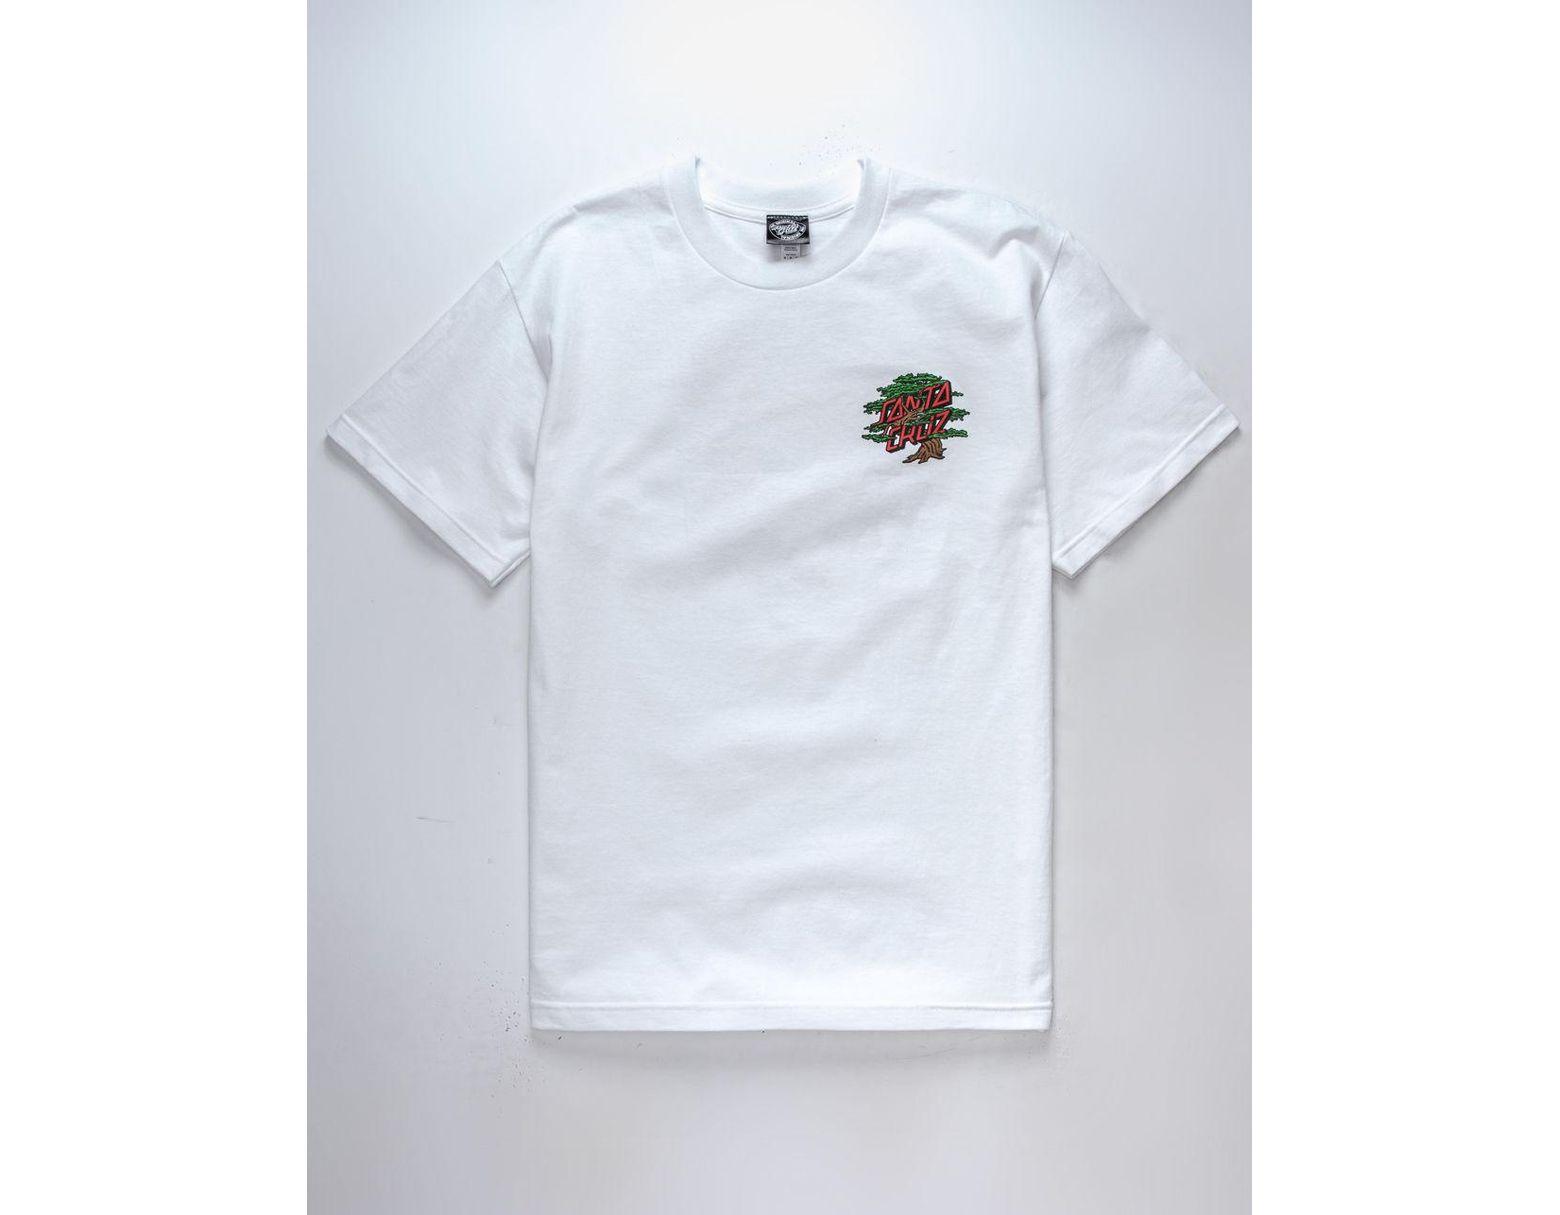 0bf2cdbf2 Santa Cruz Bonsai Dot Mens T-shirt in White for Men - Lyst